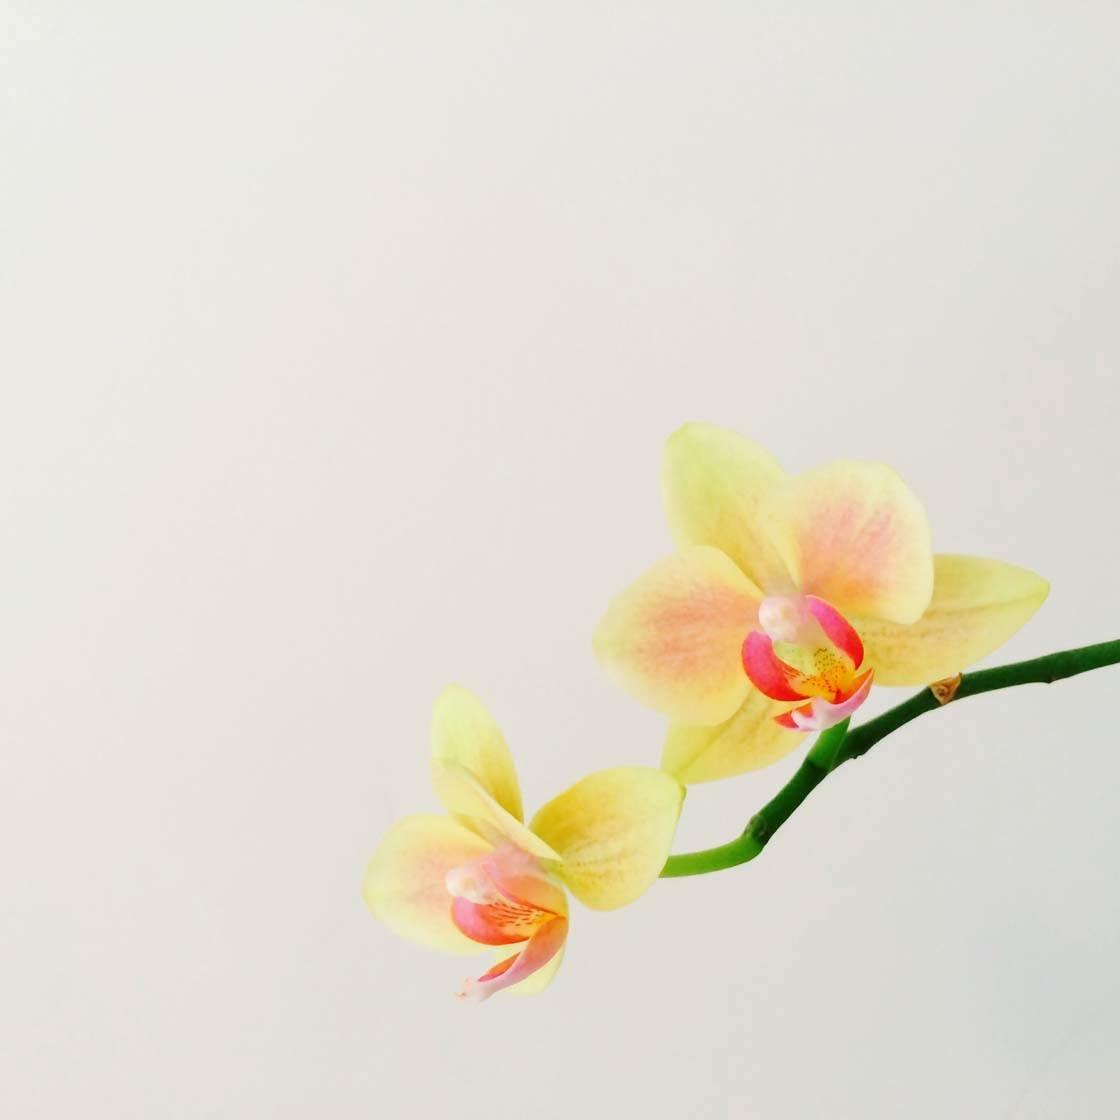 iPhone Flower Photography 6 no script